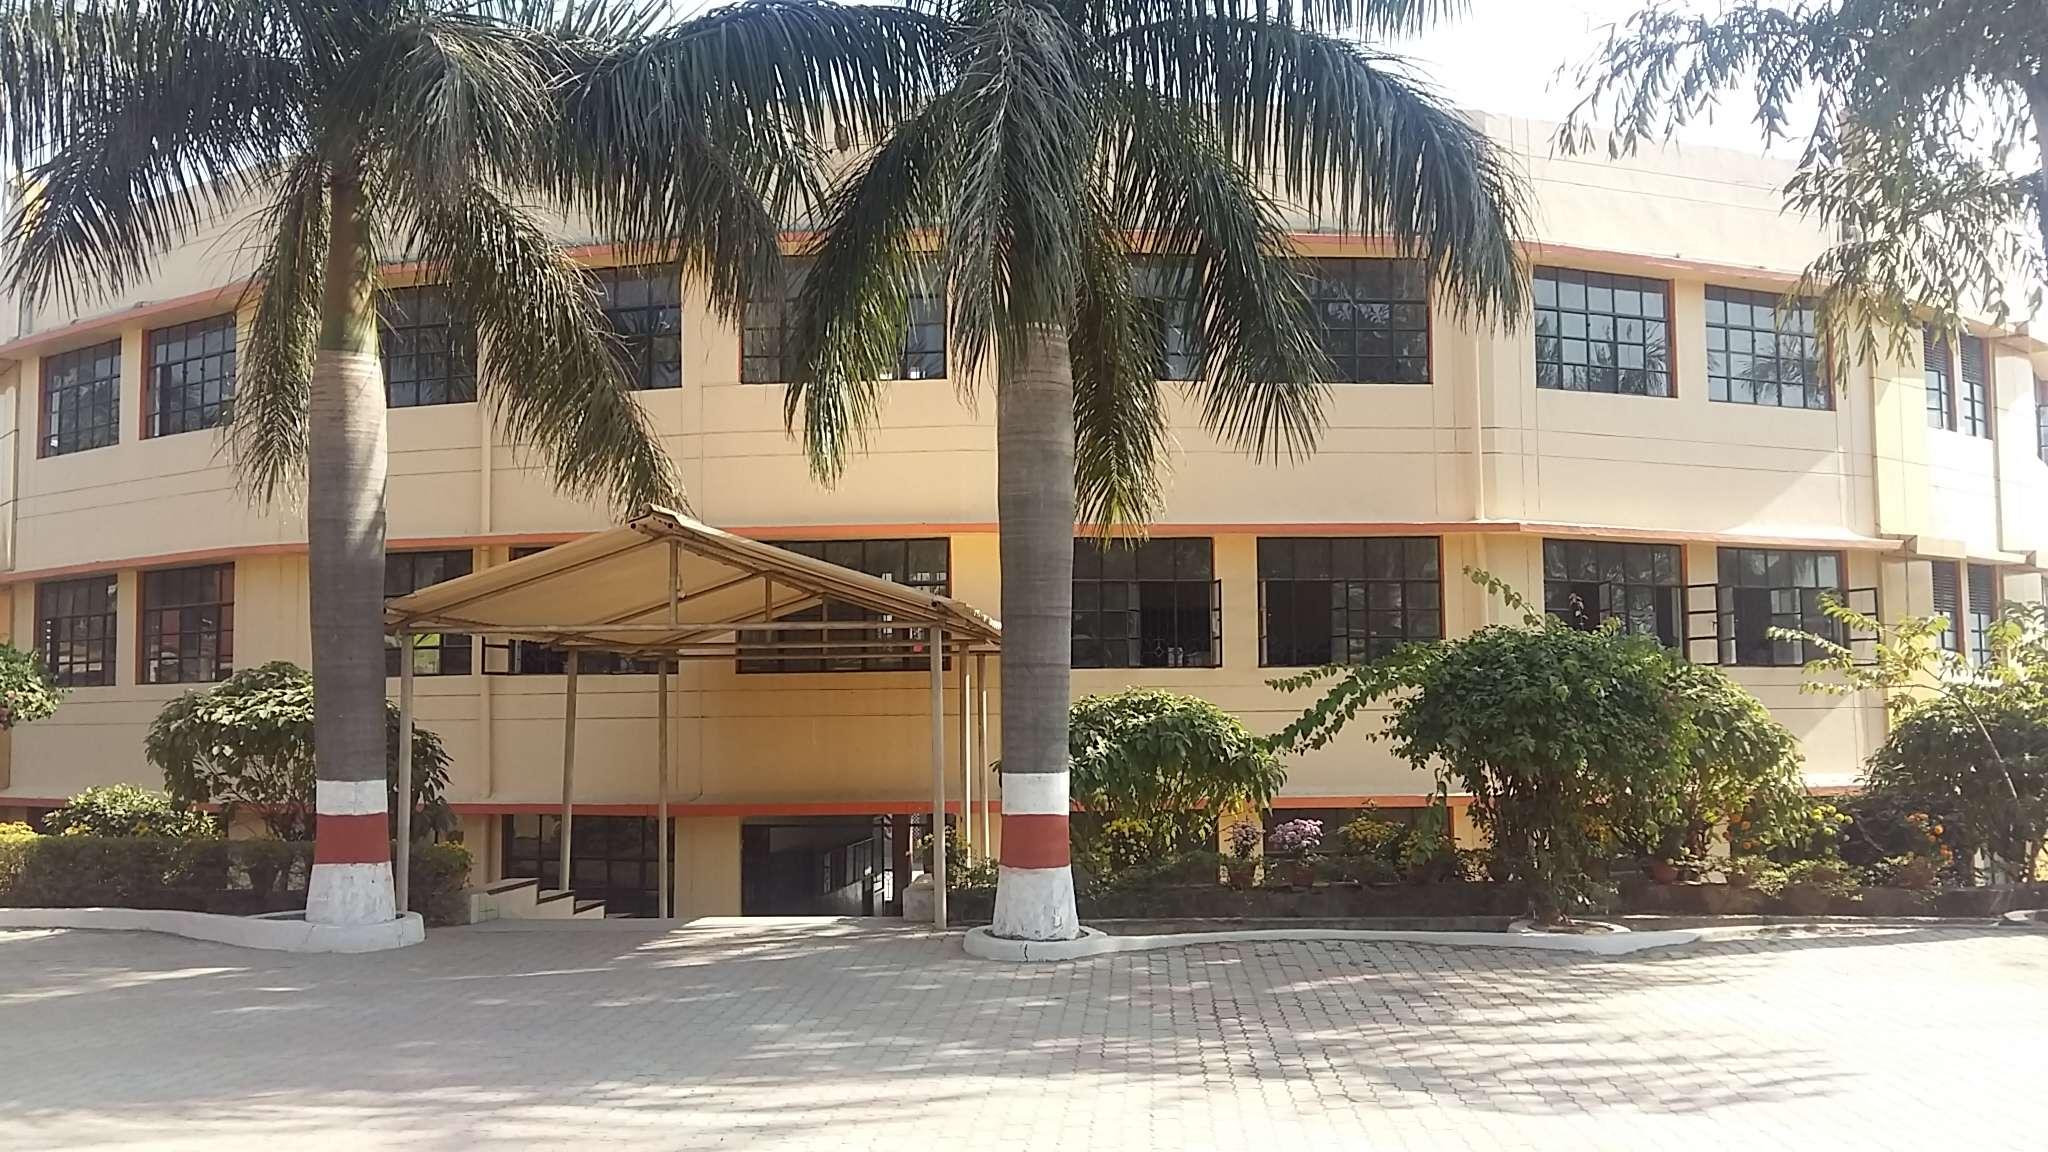 TENDER HEART SR SEC SCHOOL TUPUDANA PO HATIA RANCHI JHARKHAND 3430155